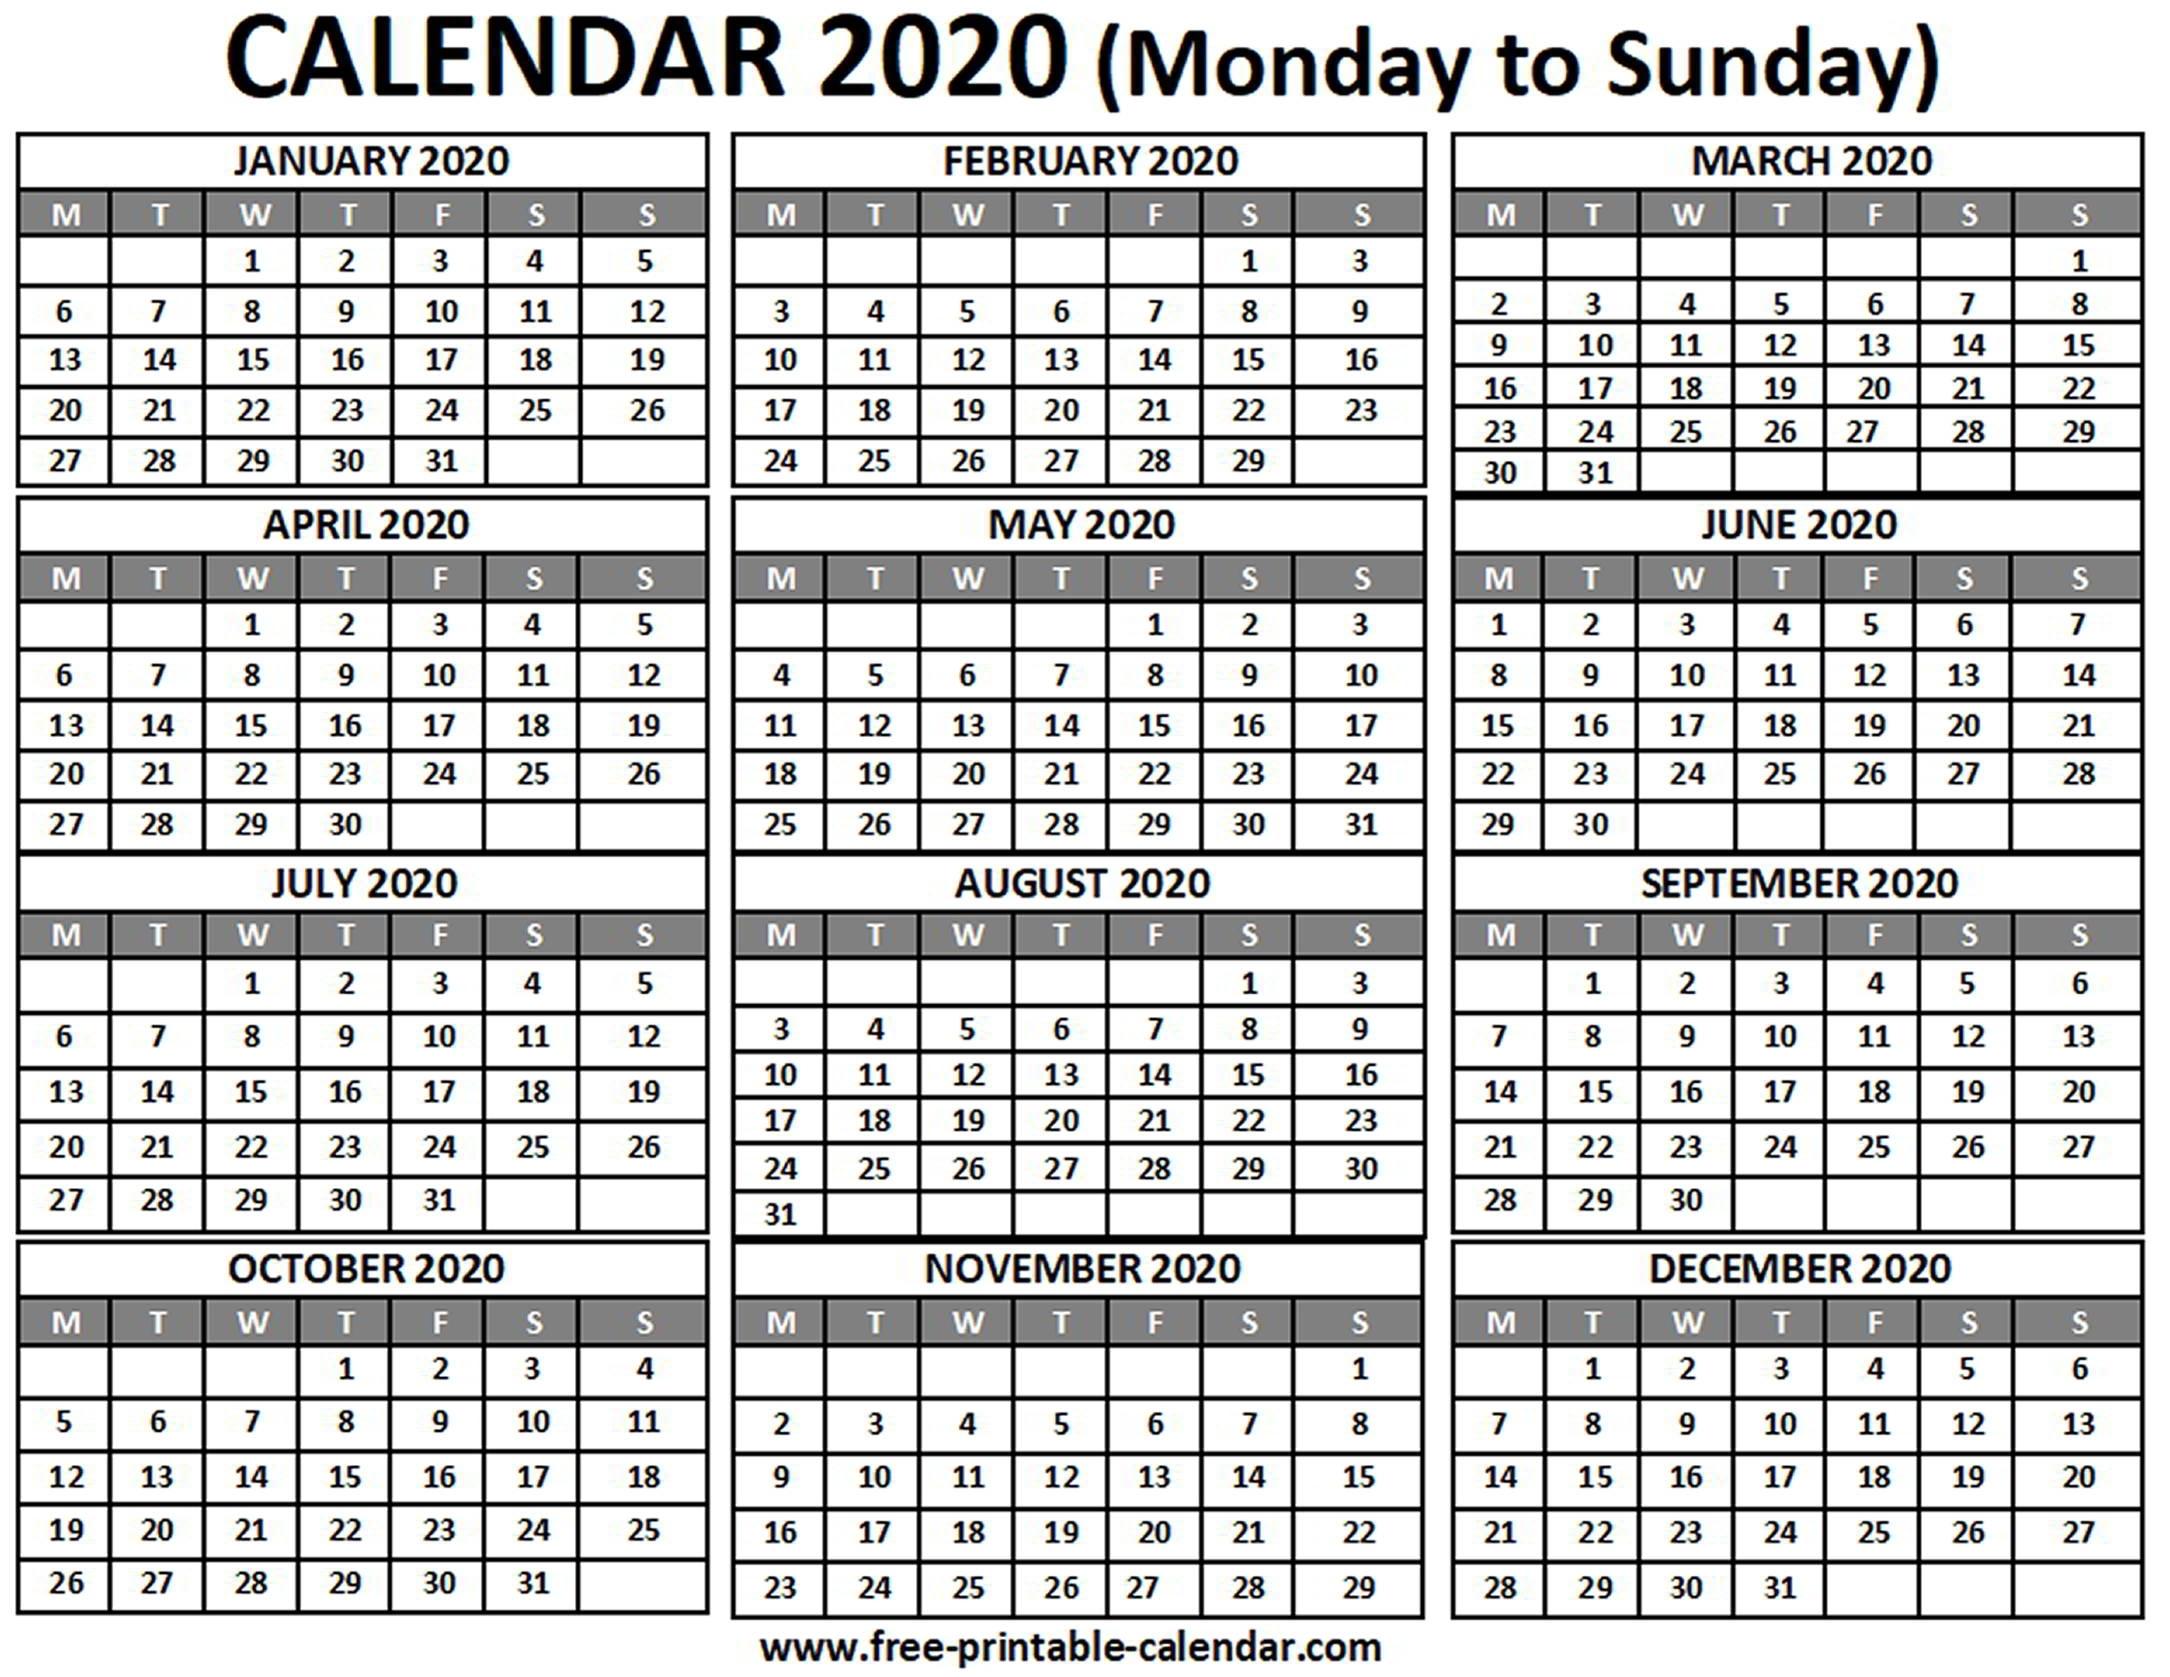 2020 Calendar - Free-Printable-Calendar inside 2020 Calendar Starting With Mondays